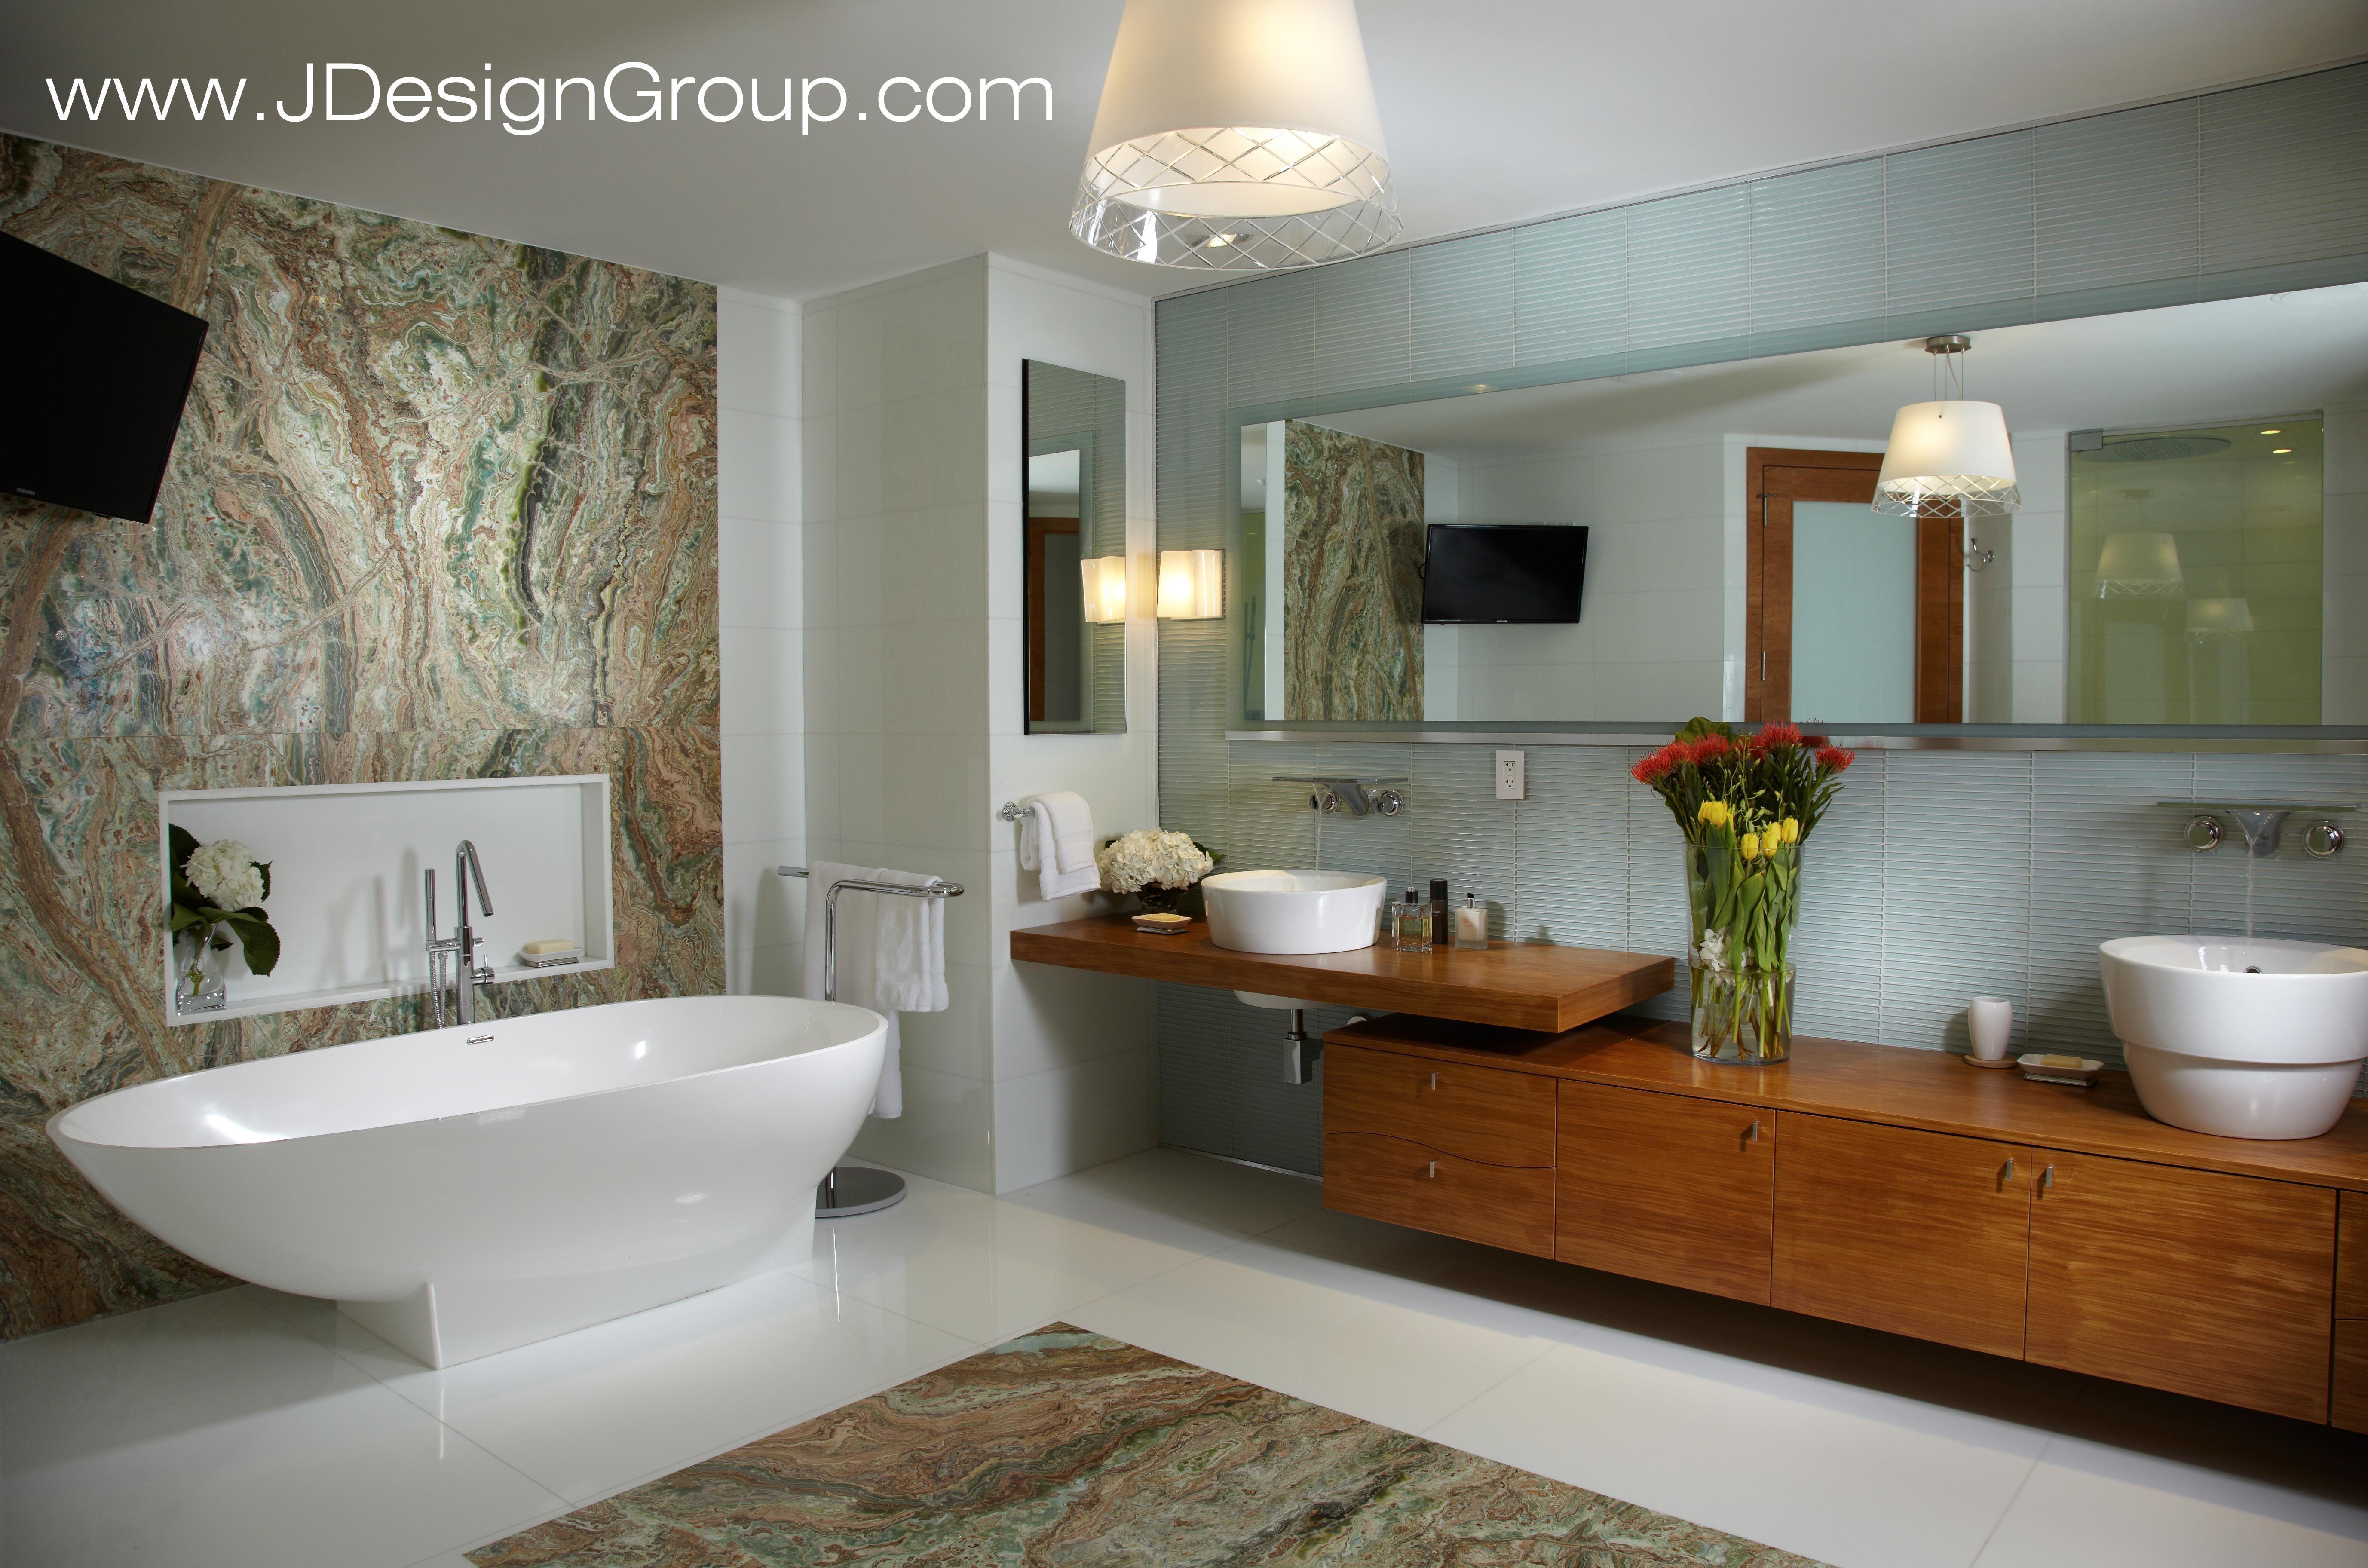 j design group 225 malaga ave coral gables, fl interior decorators